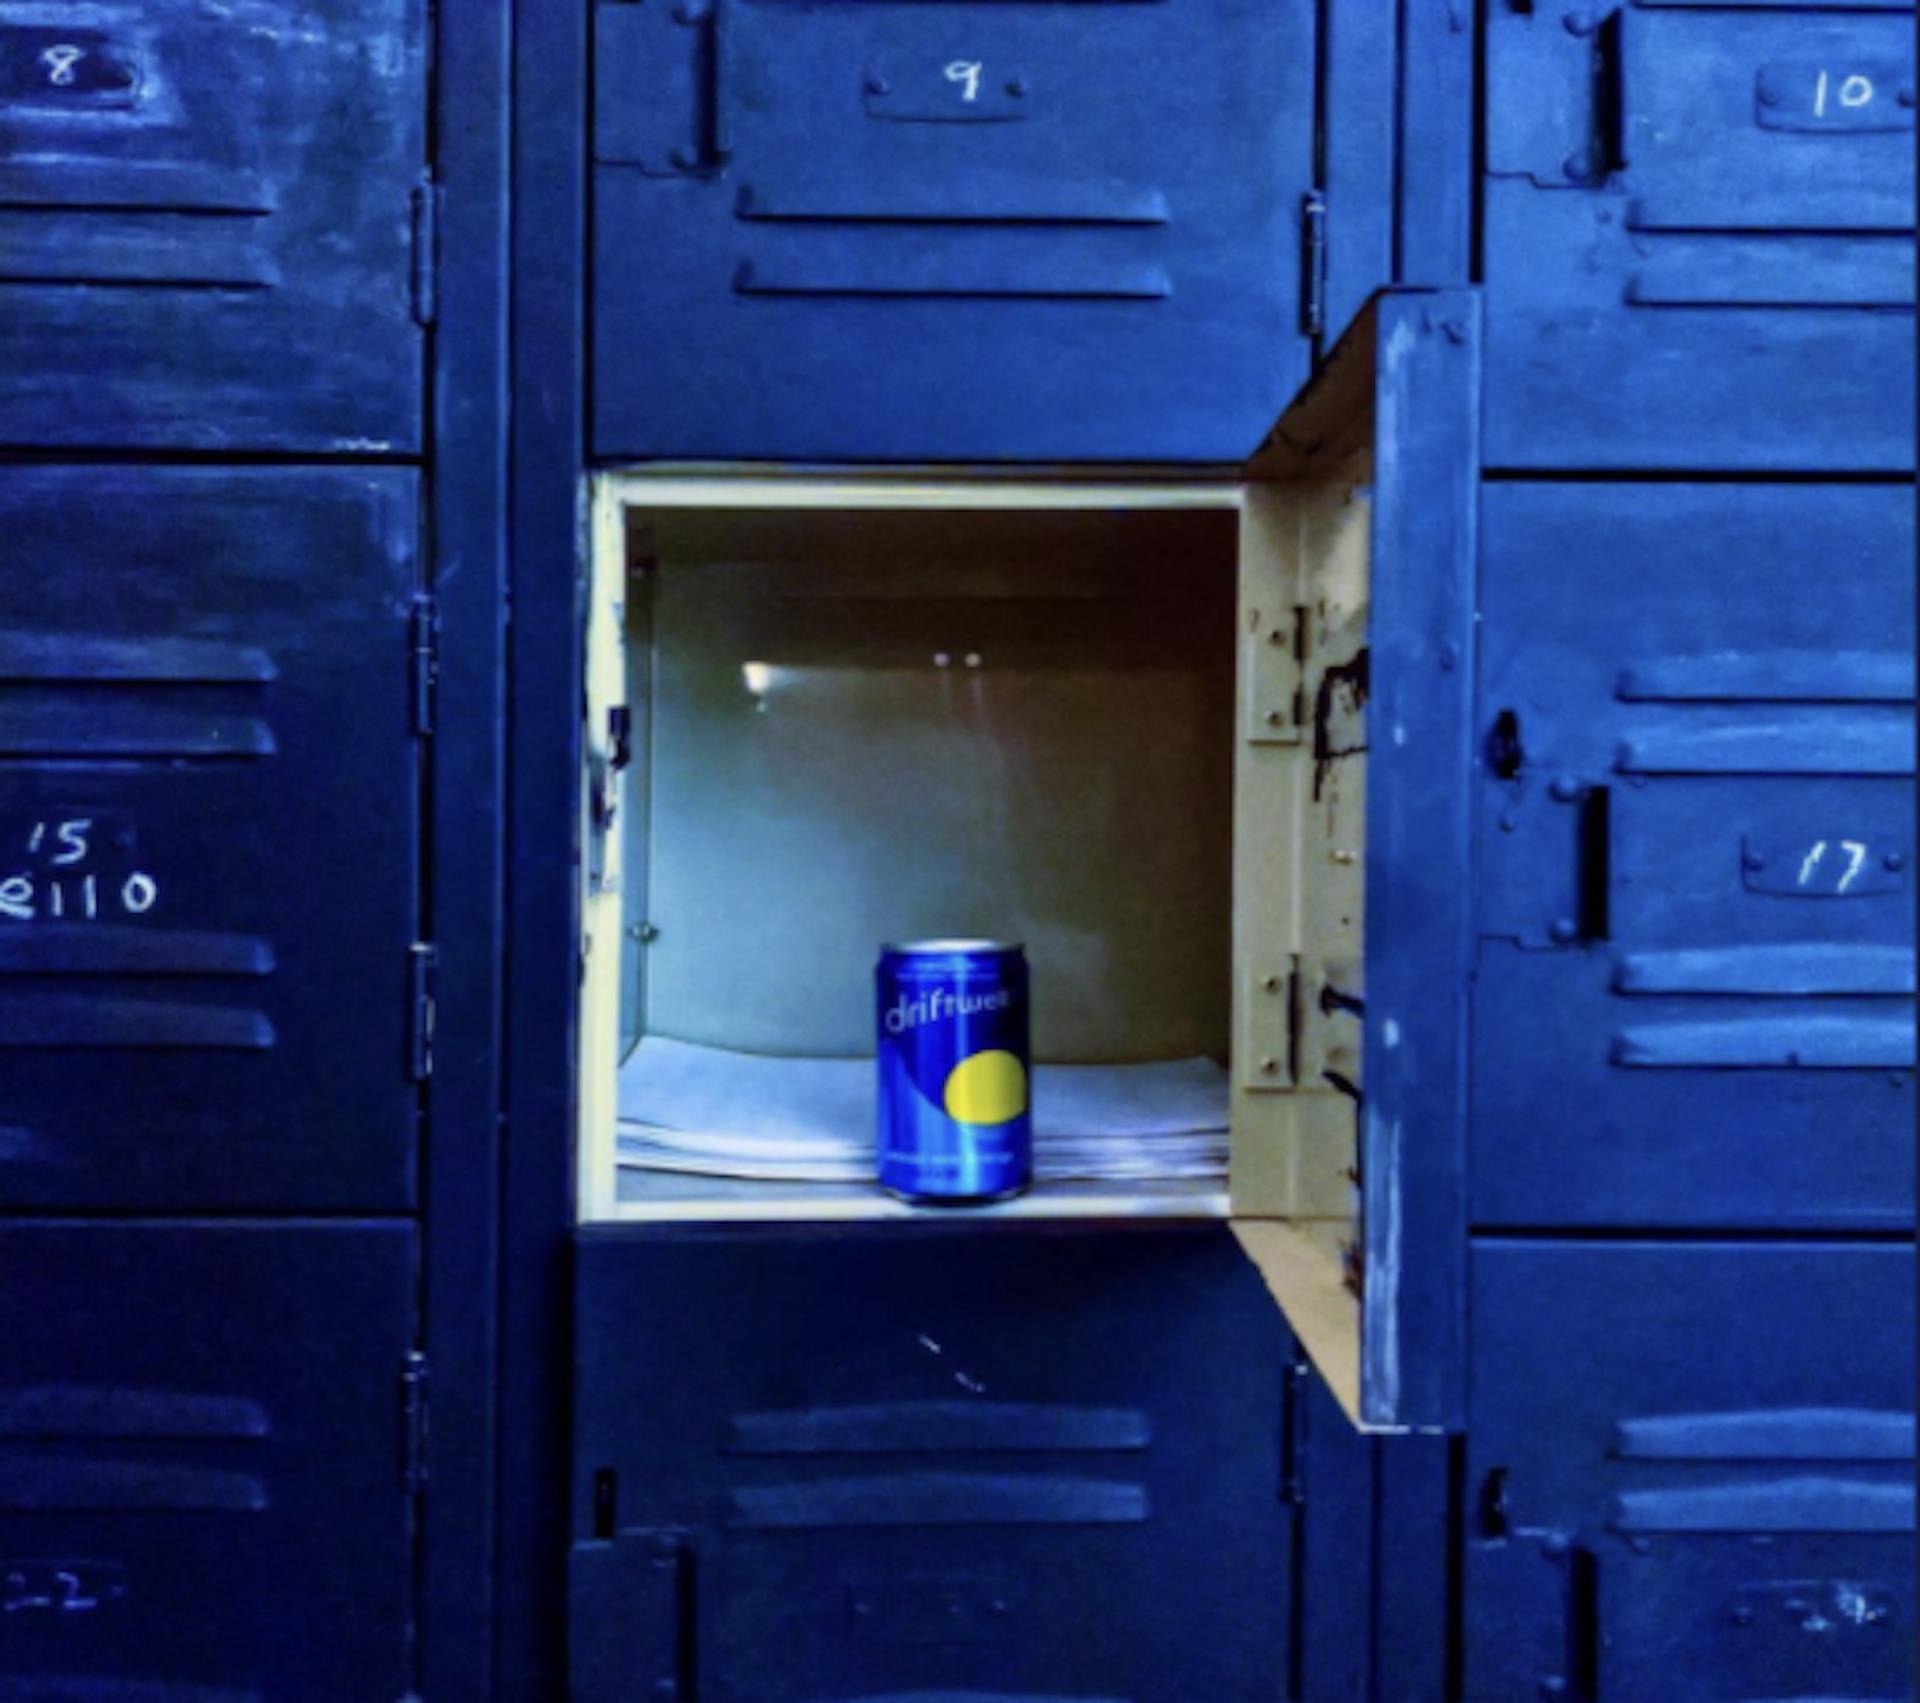 Driftwell Blue example photo